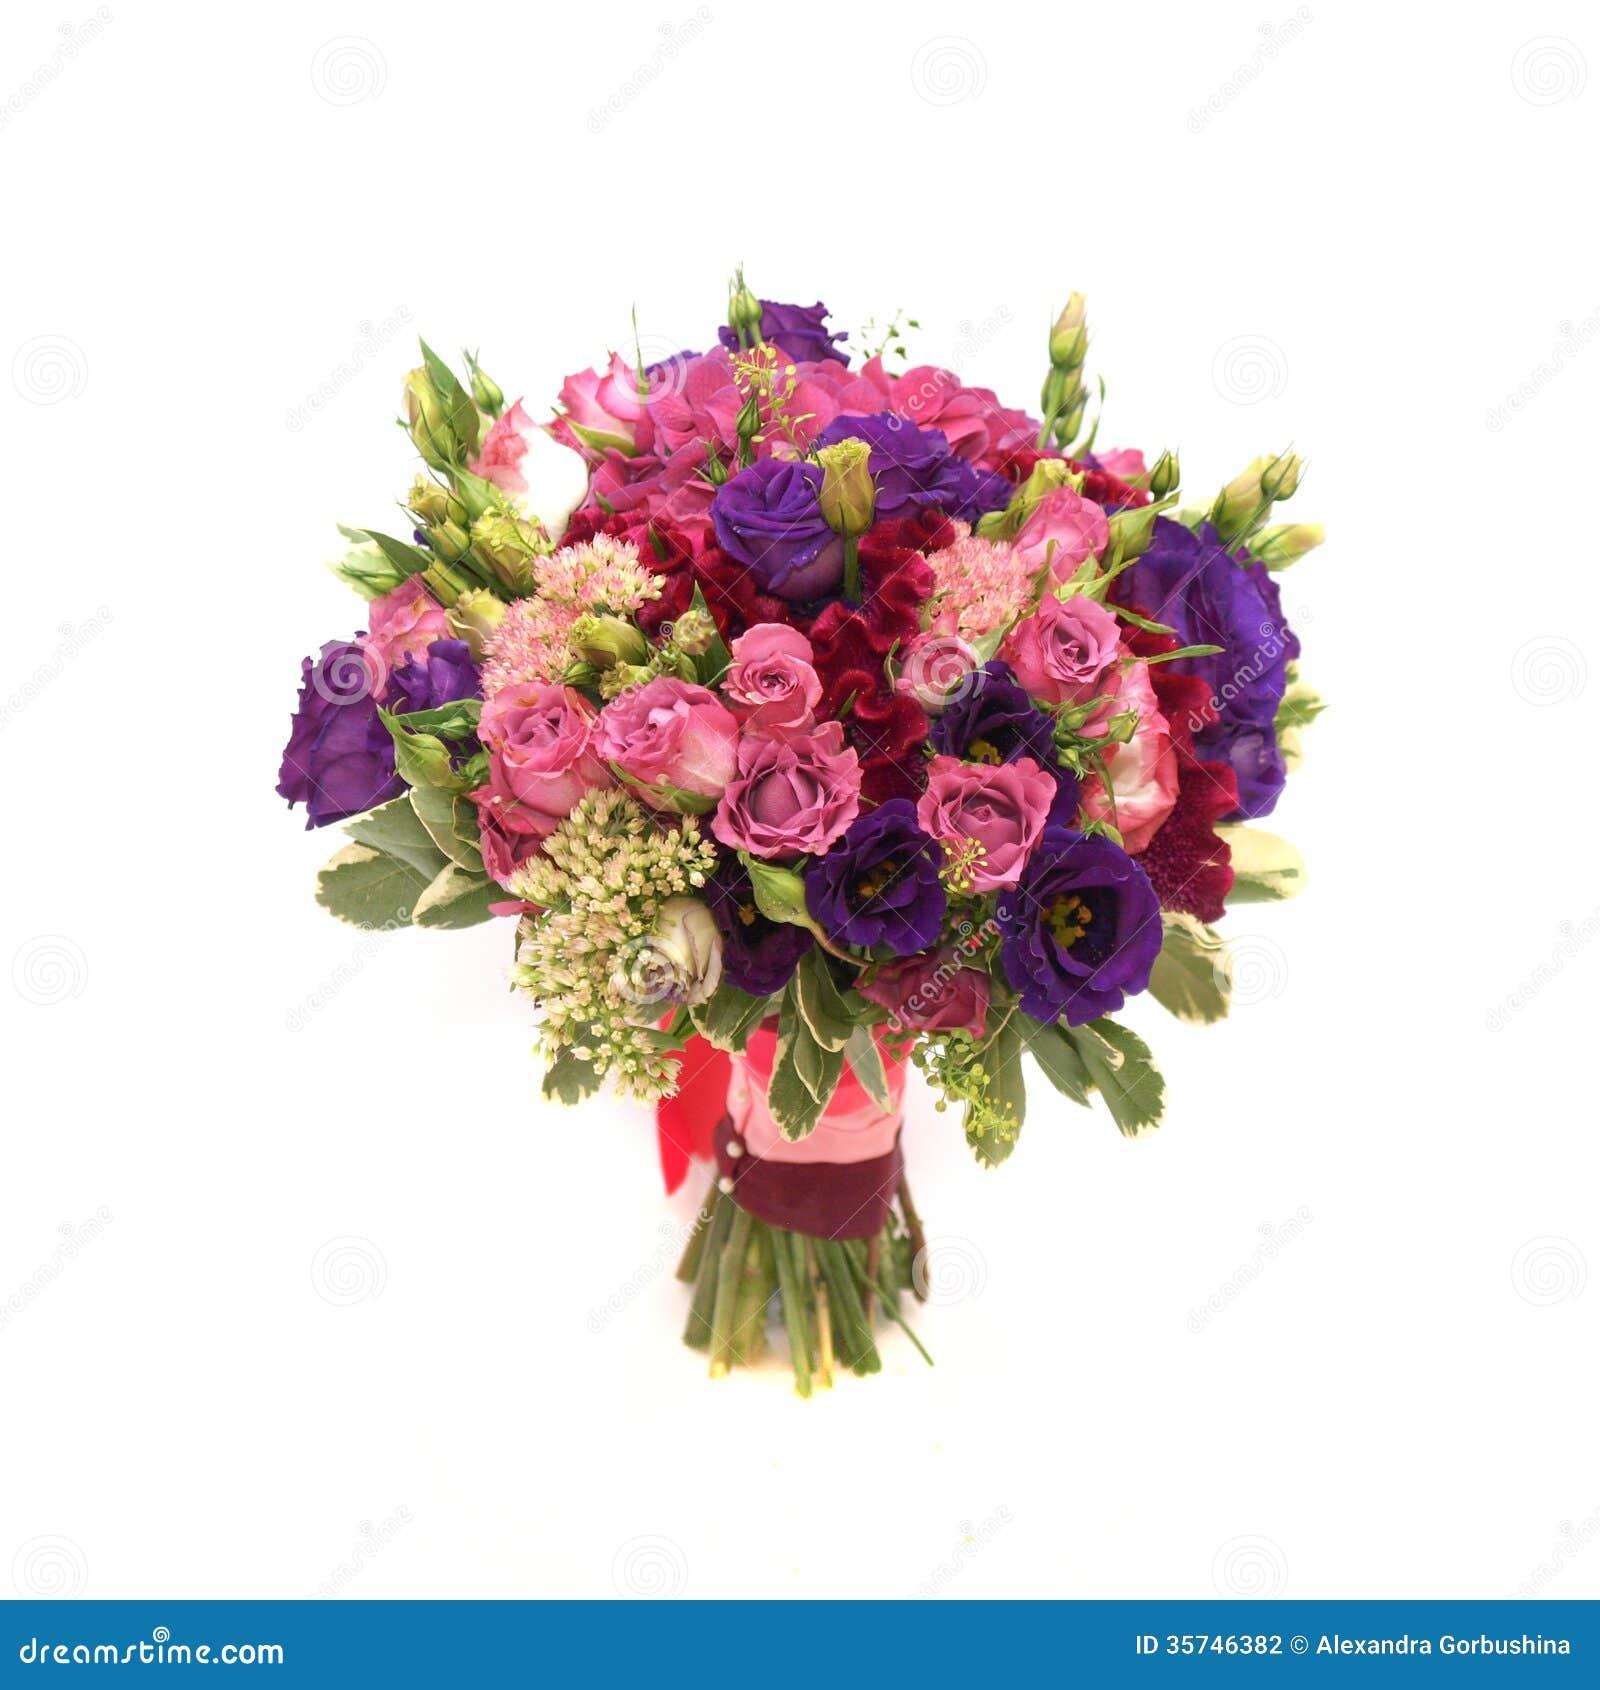 Wedding Flower Background: Colorful Wedding Bouquet On White Background Stock Photo